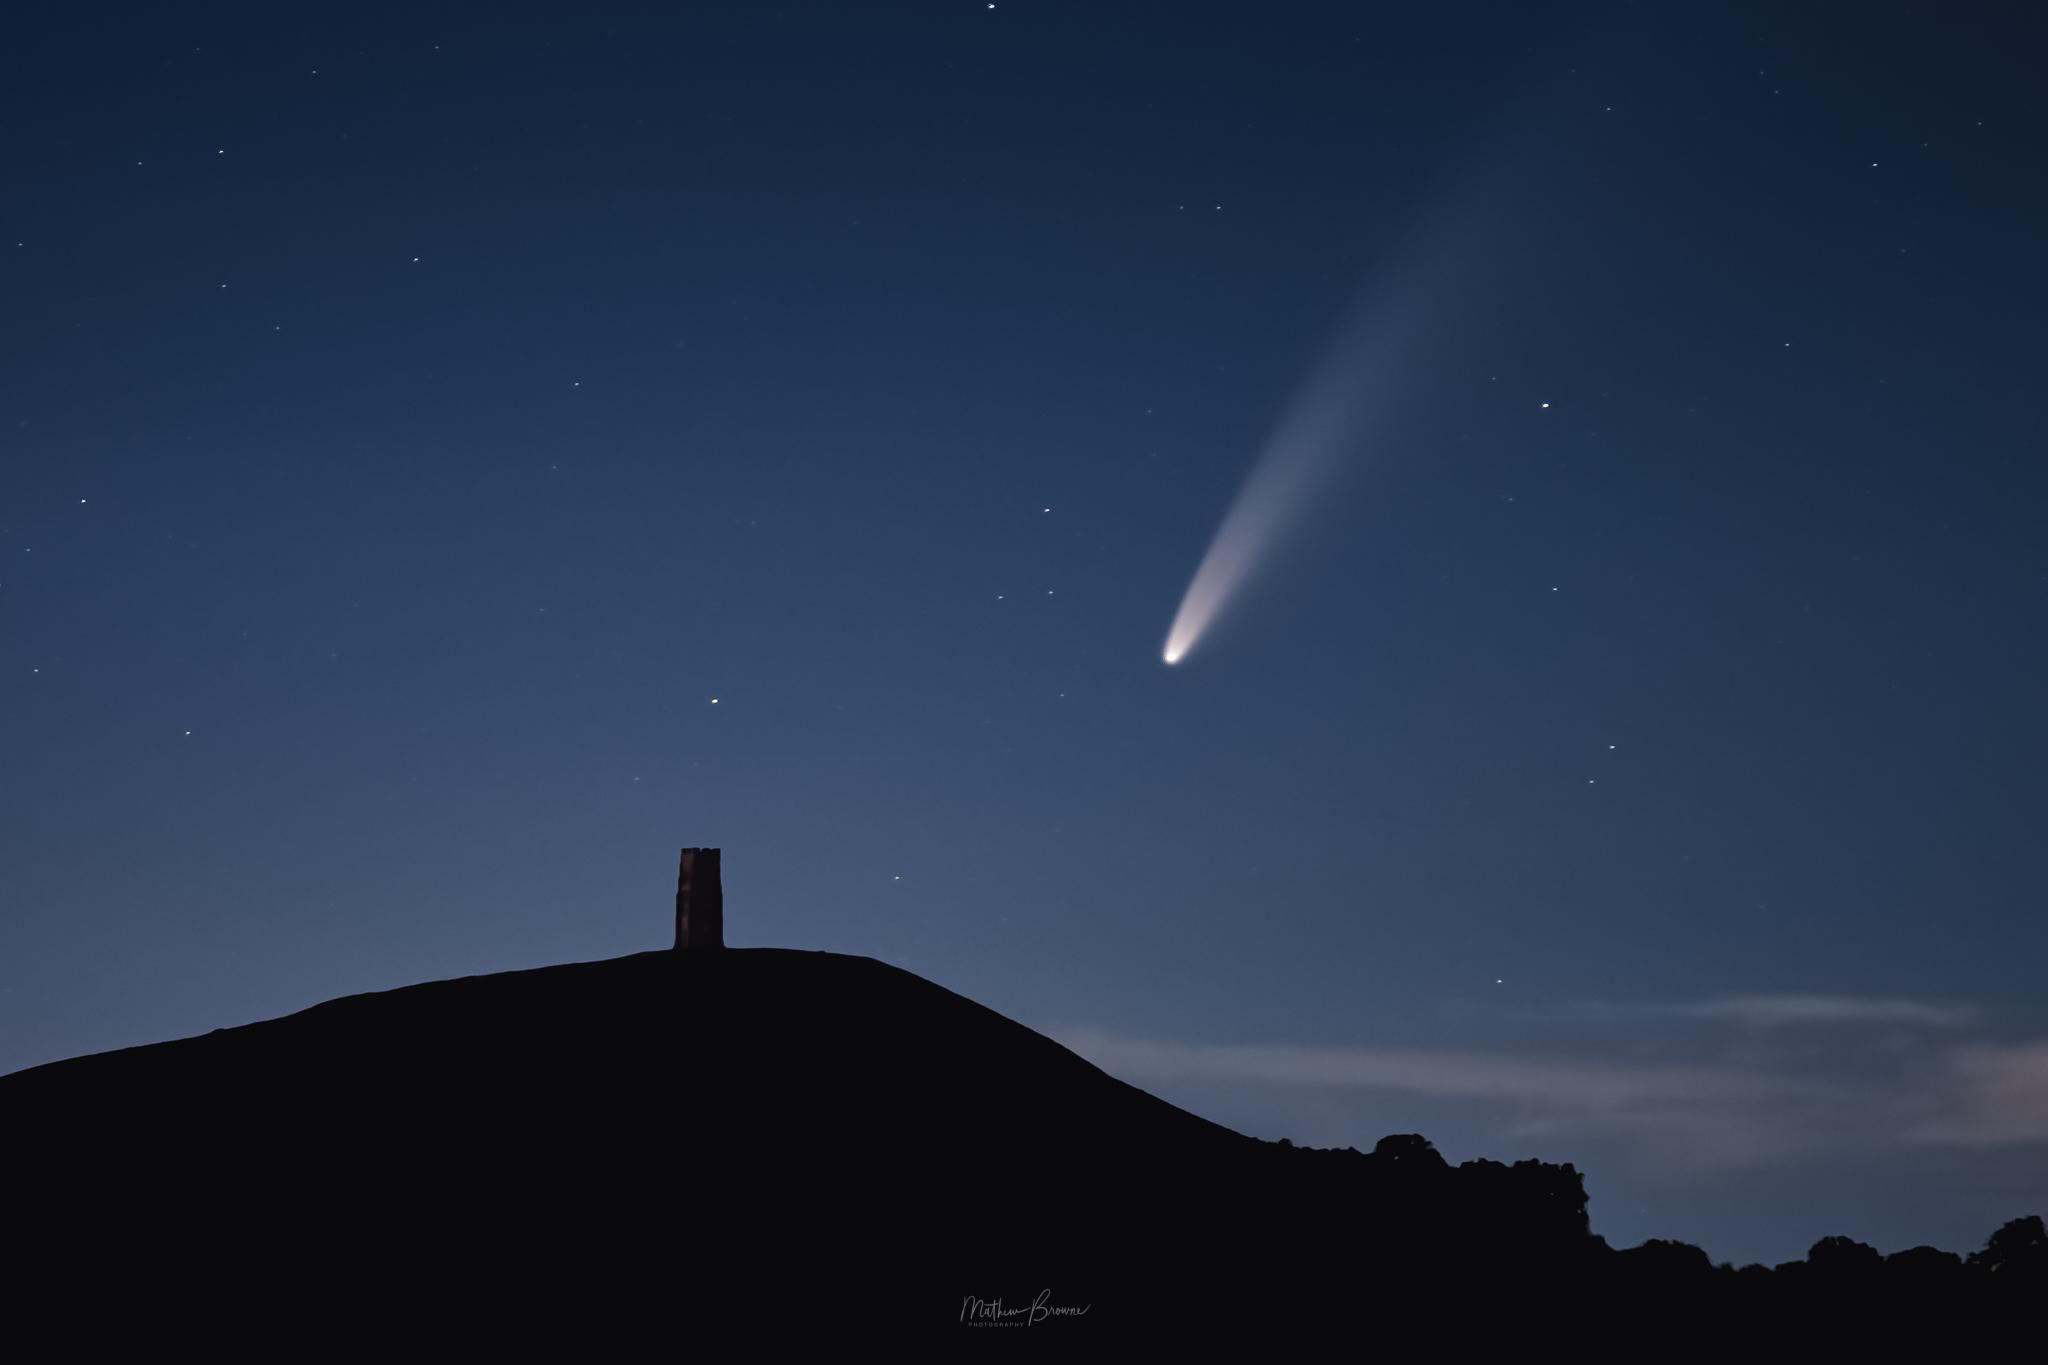 Glastonbury with comet NEOWISE